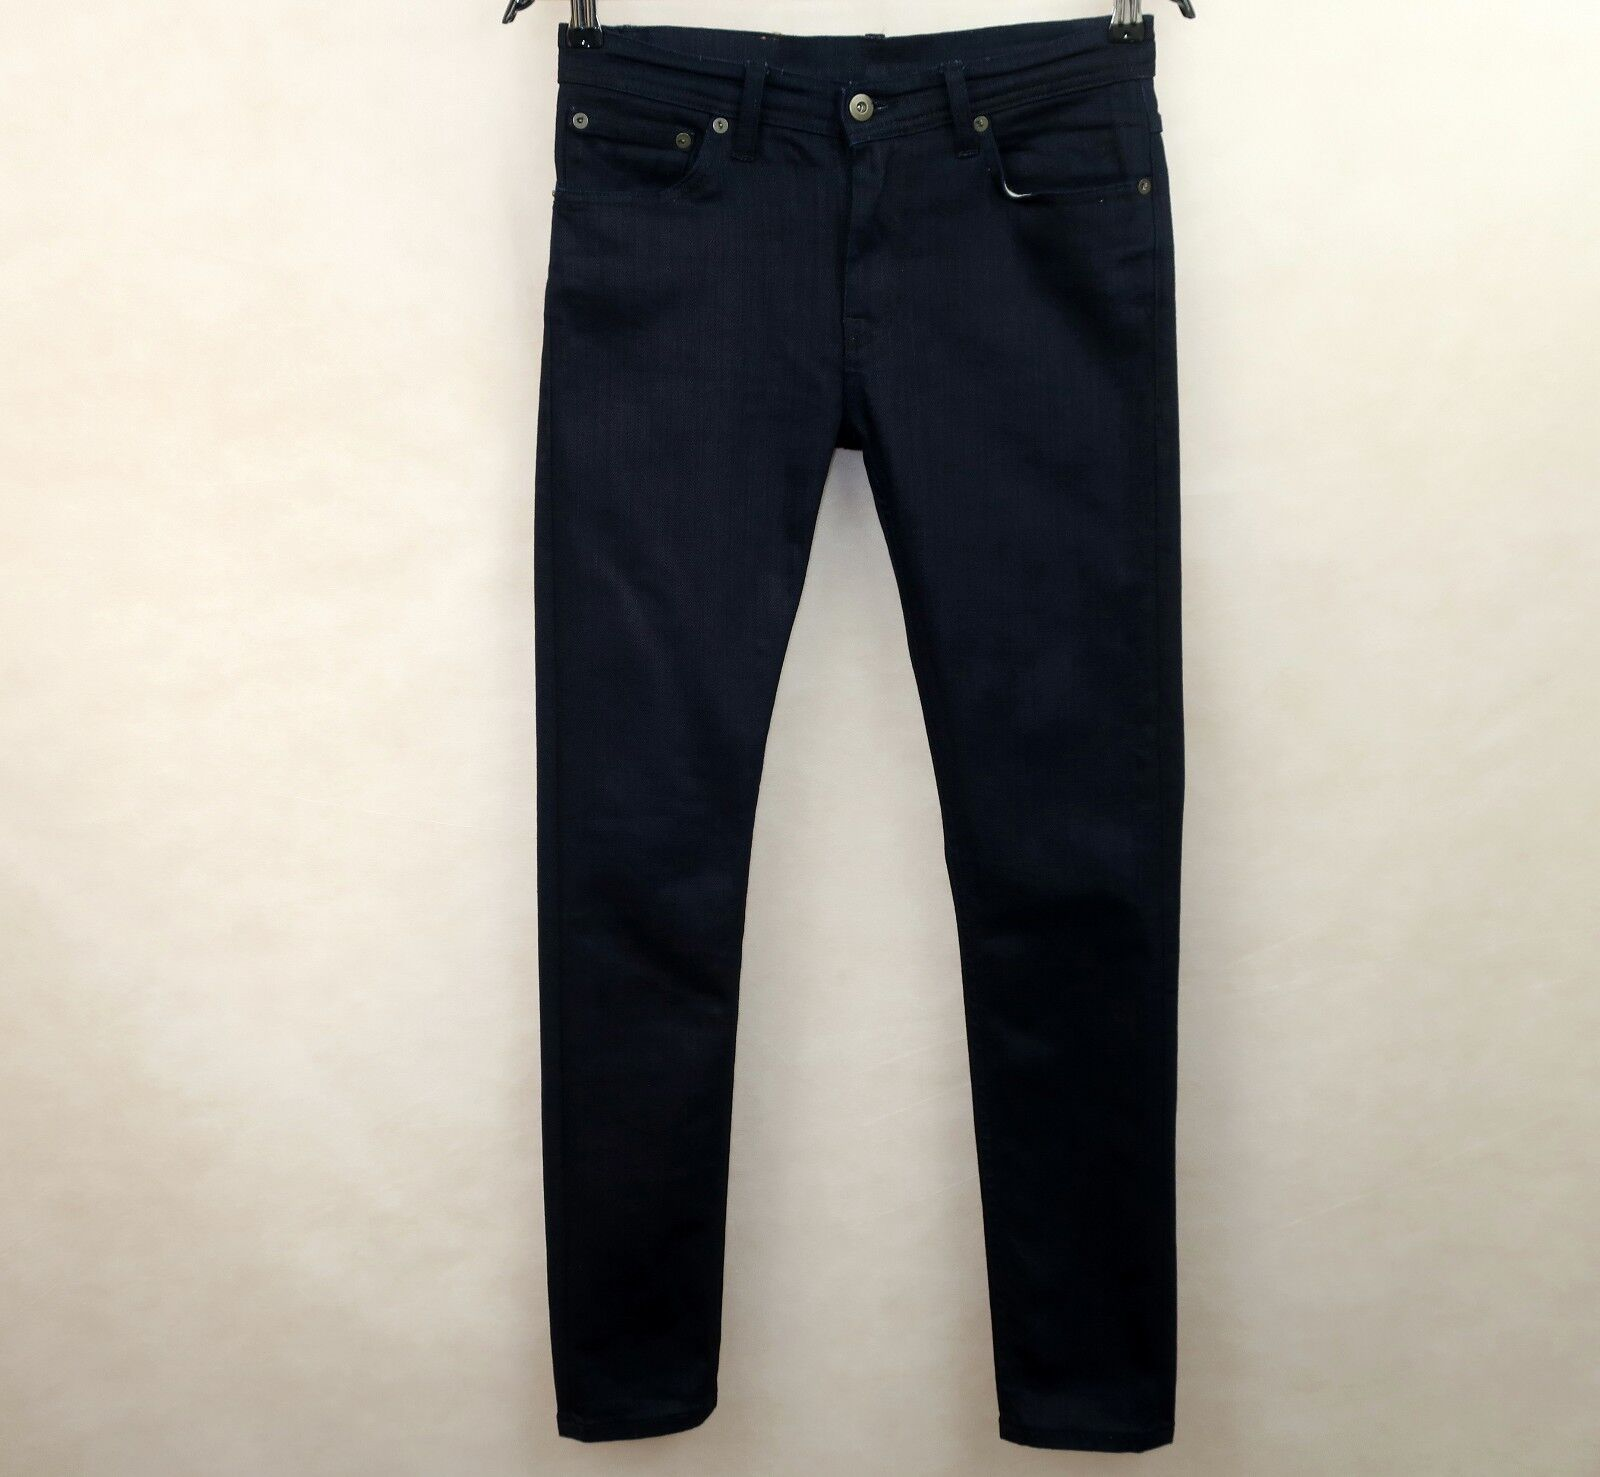 9d6c0dd0 LIVID JEANS WOMENS AVA JAPAN COMFORT blueE JEANS AVA MID RISE size W27 L30  NAVY nkvutd8120-Jeans